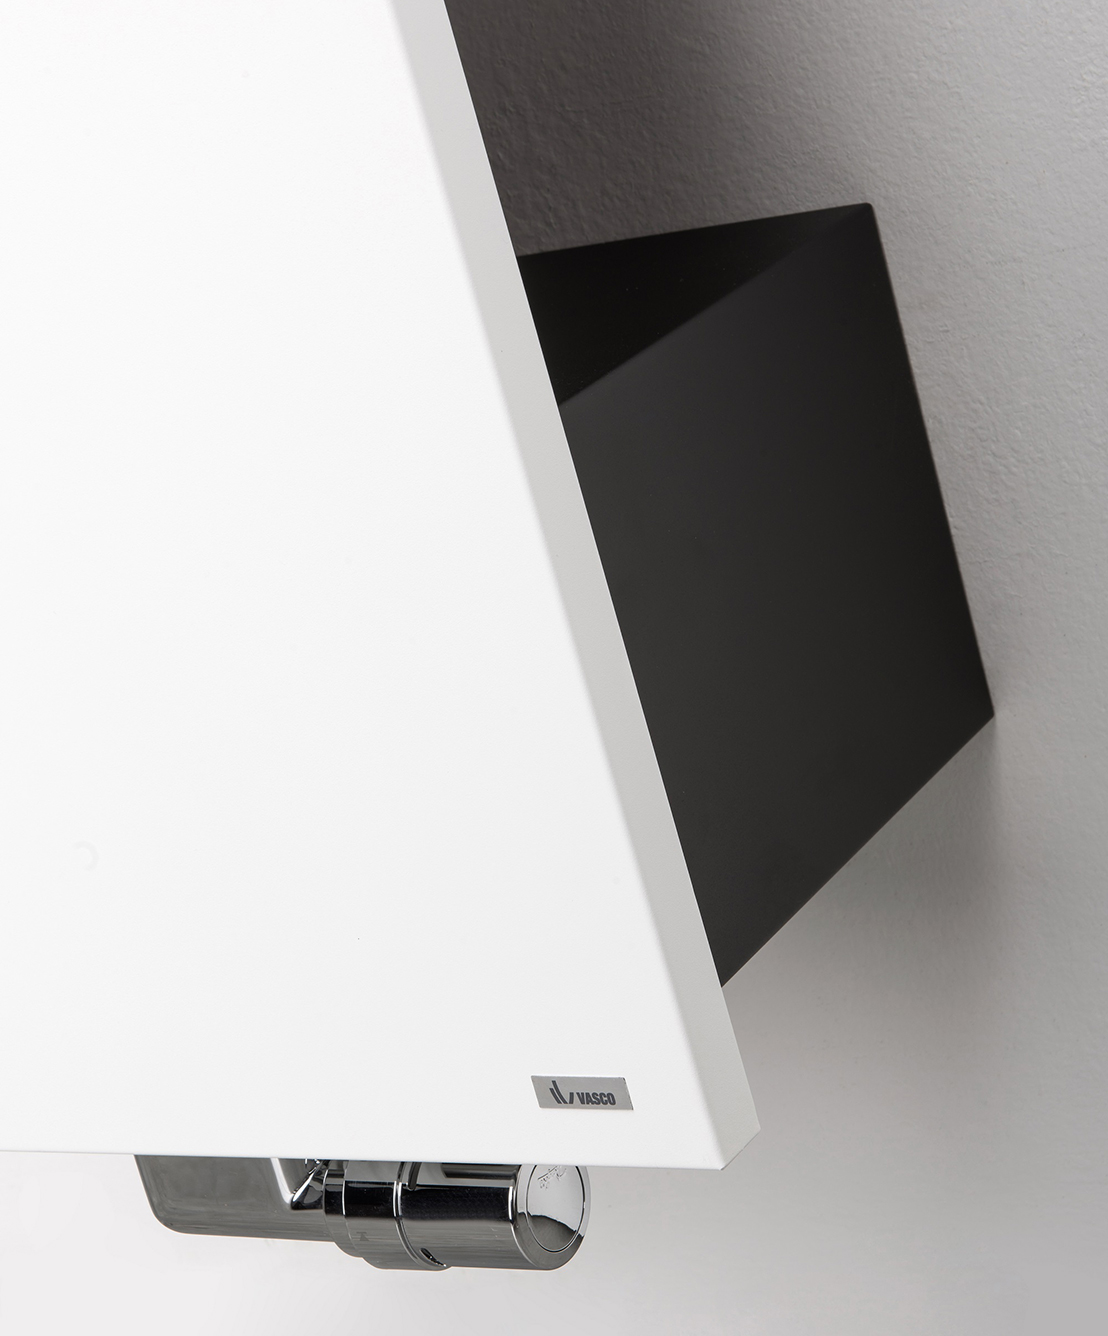 Calorifere  baie Niva Bath NS1L1 2020x440mm, 1023W